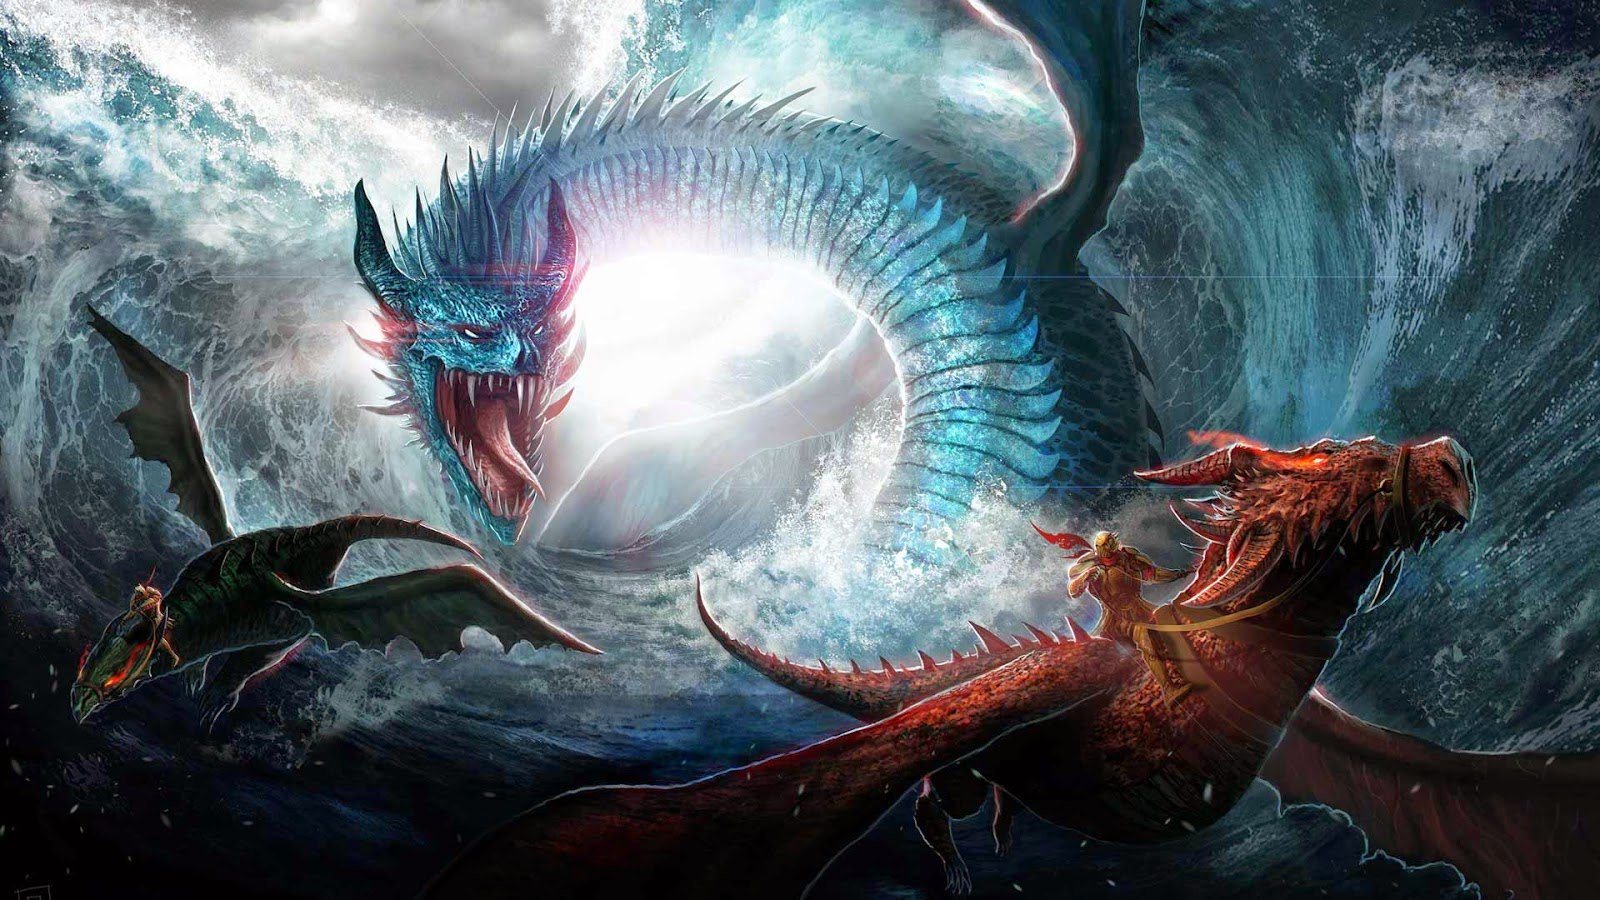 Papel de Parede Dragões Lendários Lutando para pc hd grátis Dragon desktop hd wallpaper image free